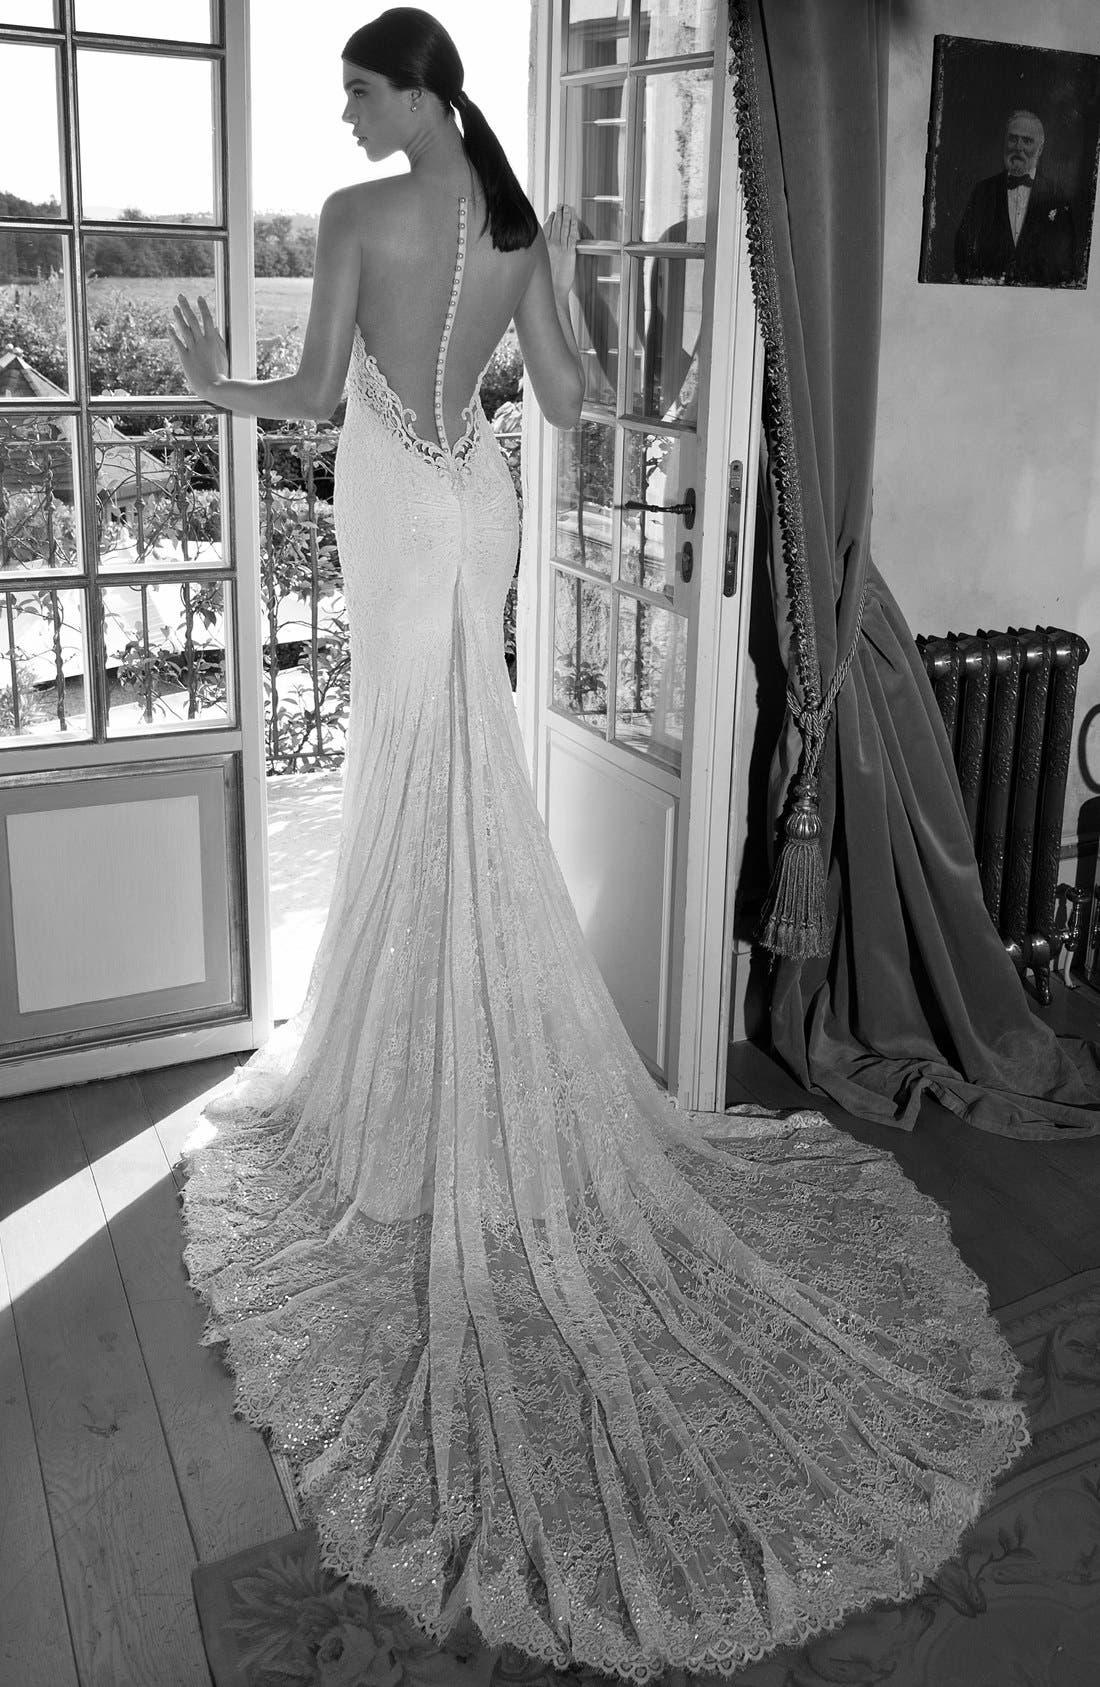 Plunging V-Neck Strapless Lace Dress,                             Alternate thumbnail 2, color,                             Ivory